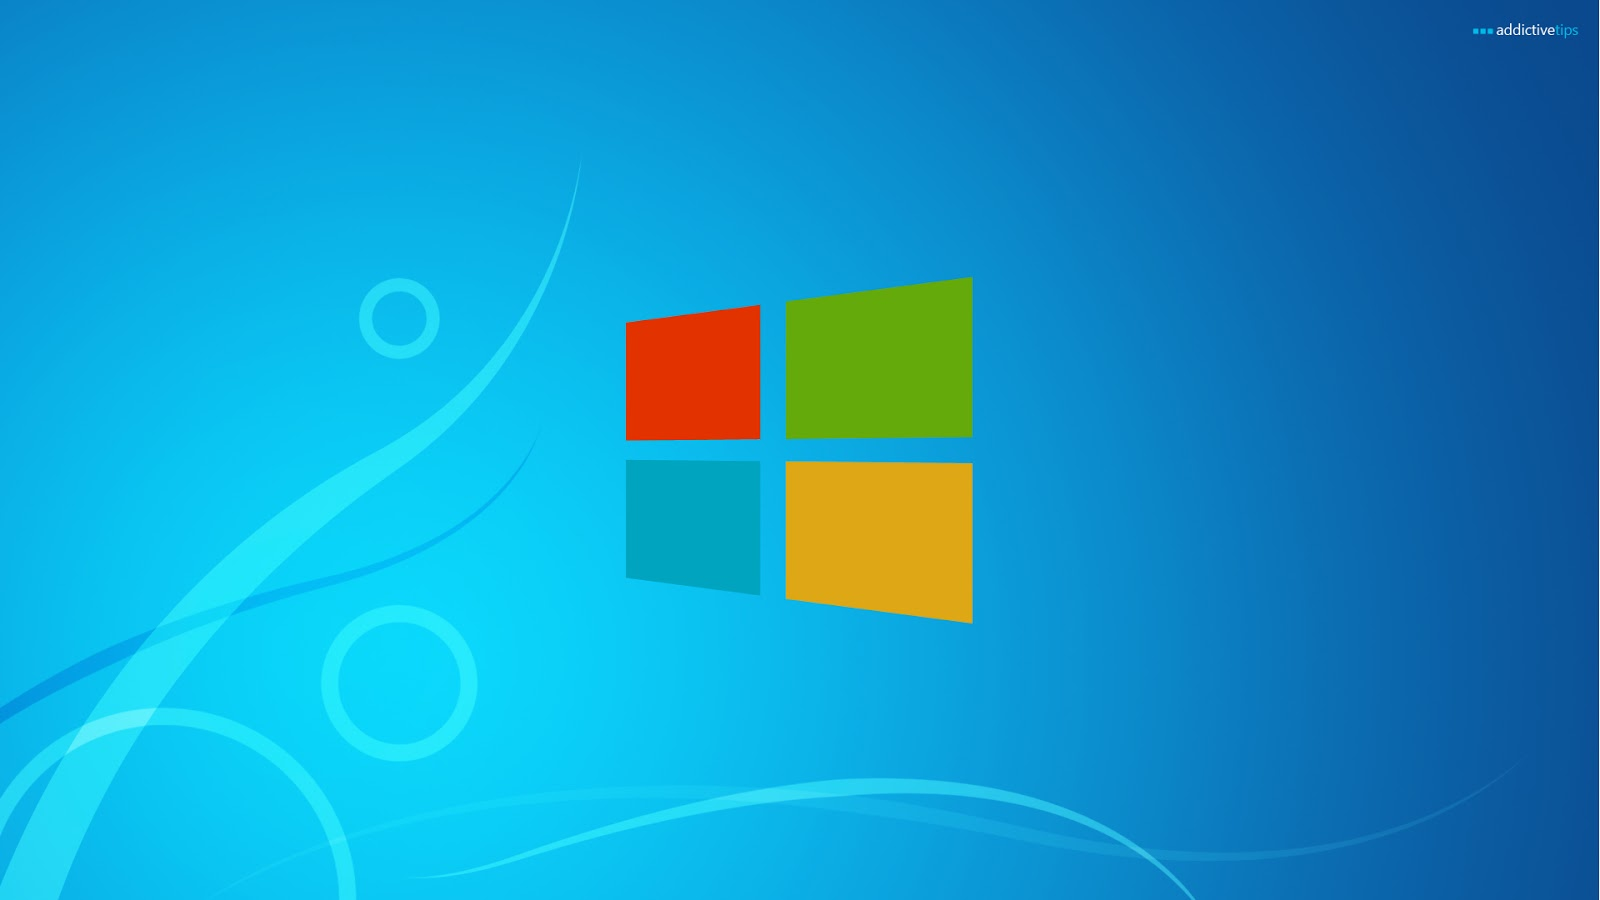 New windows 10 wallpaper hd wallpapersafari for Windows new window